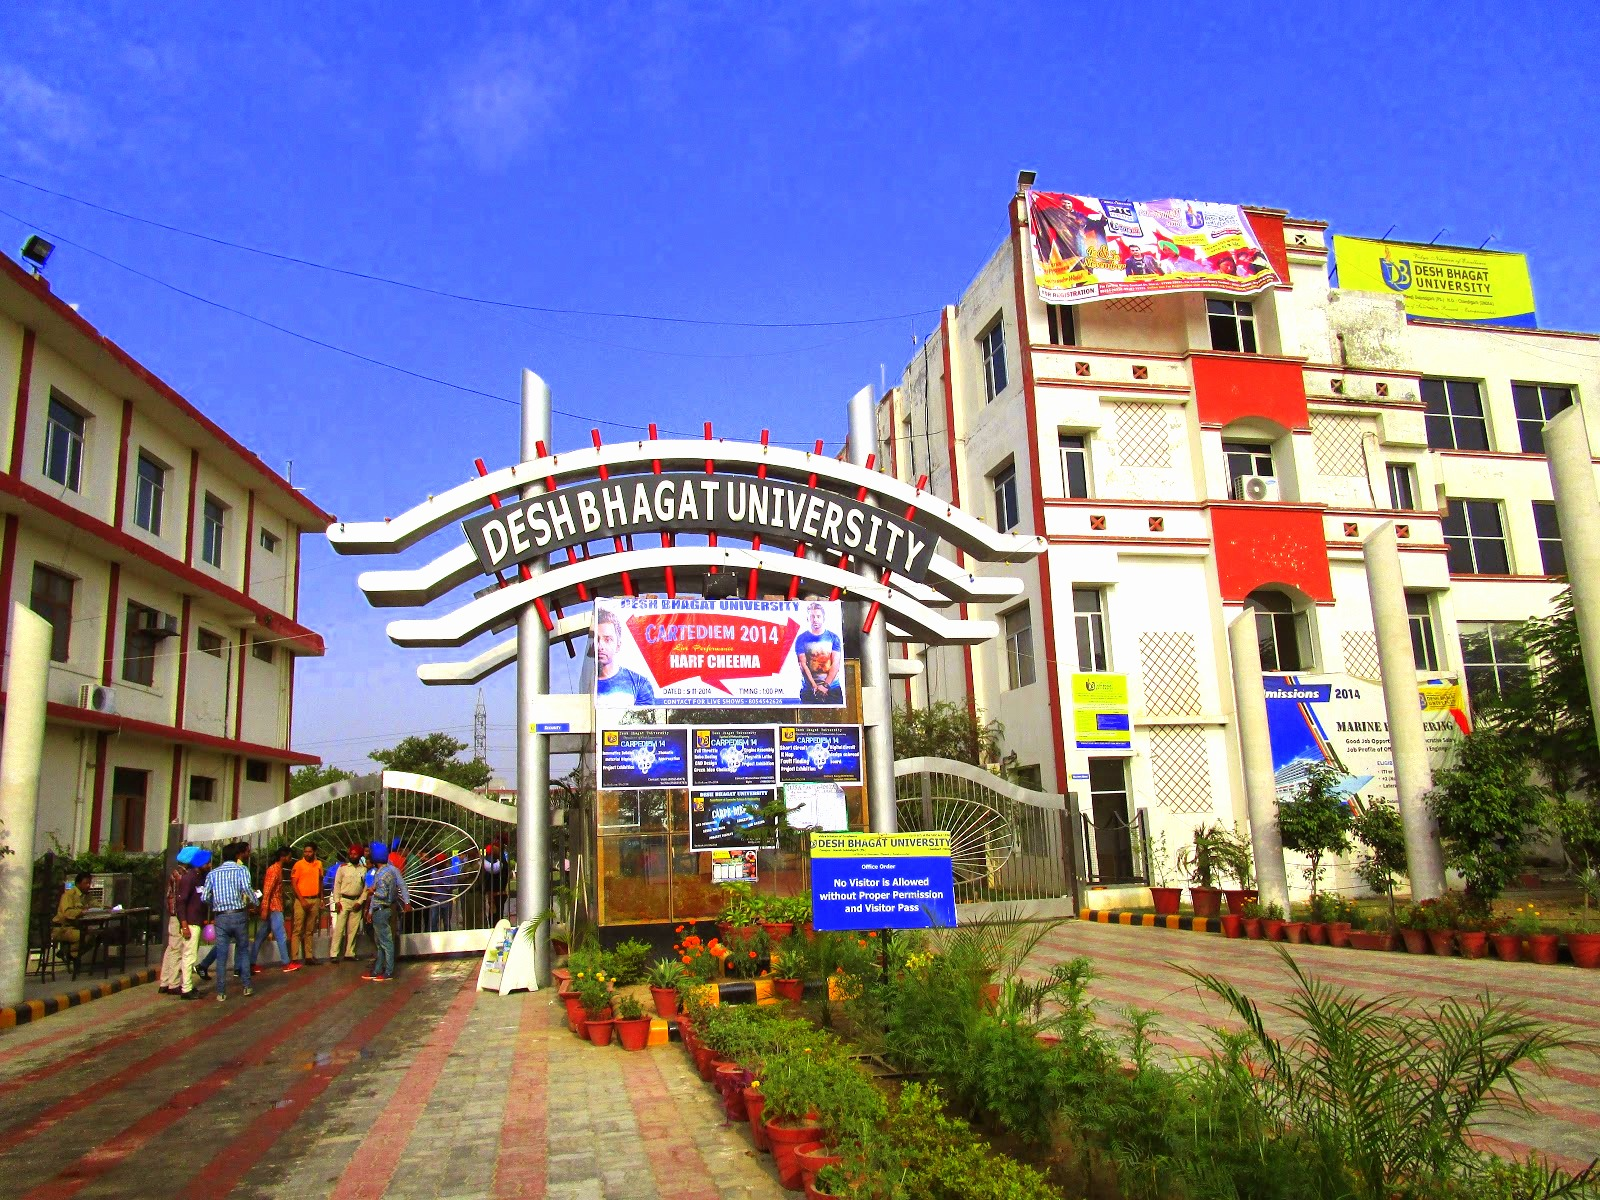 Desh Bhagat University, Fatehgarh Sahib Image